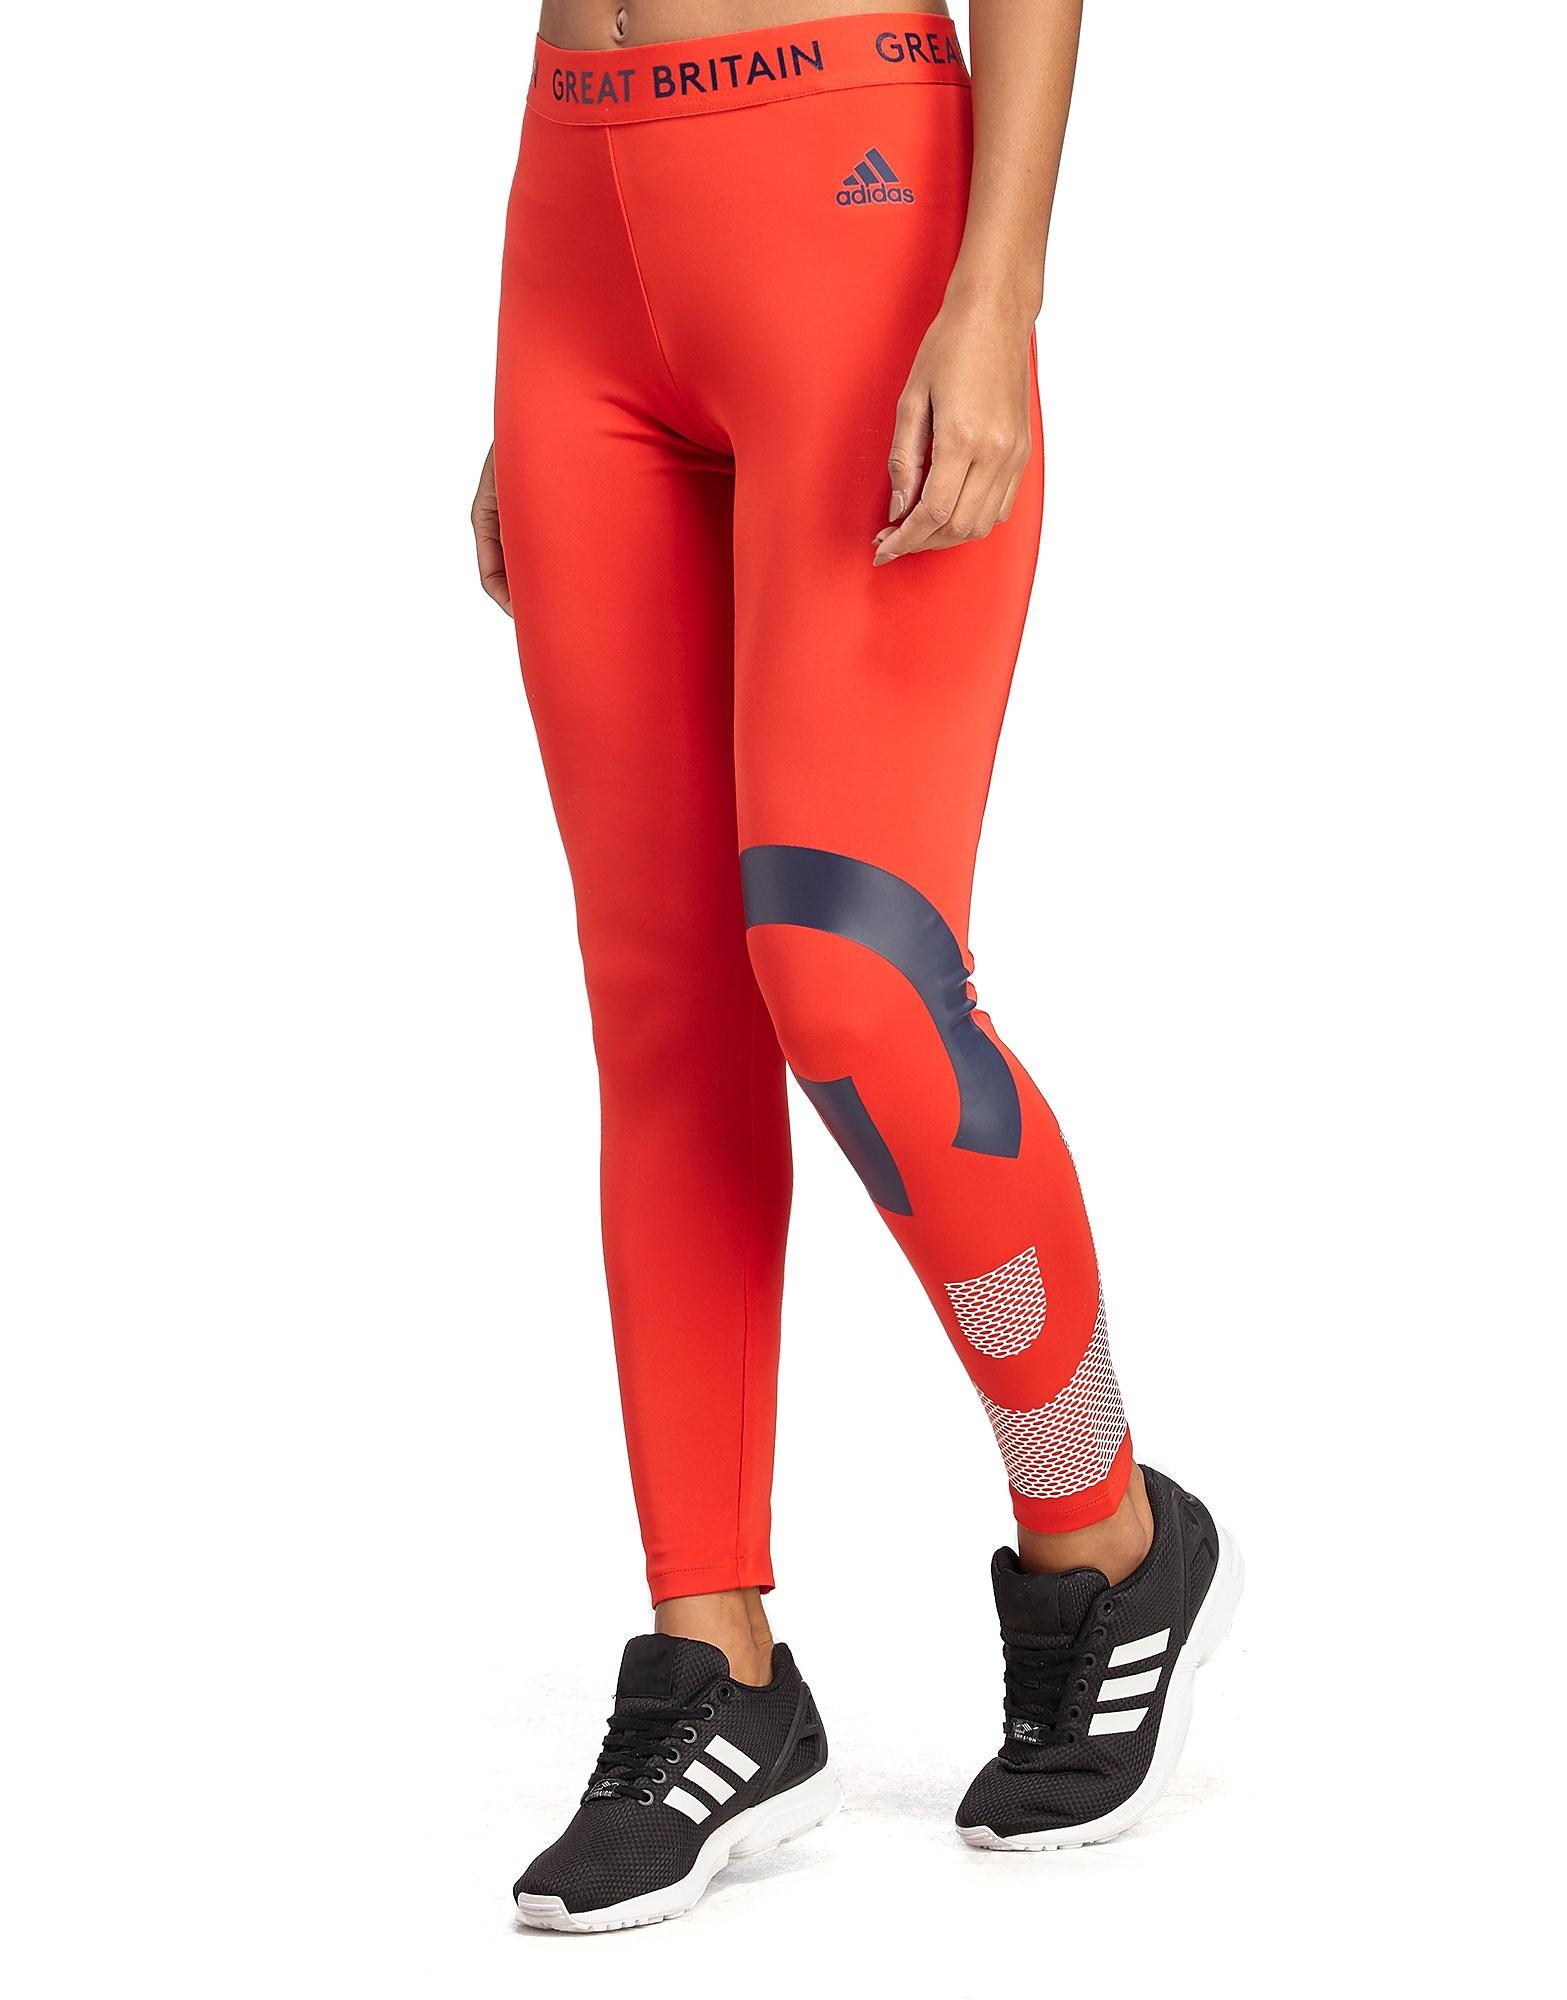 adidas Team GB Village Wear Tights